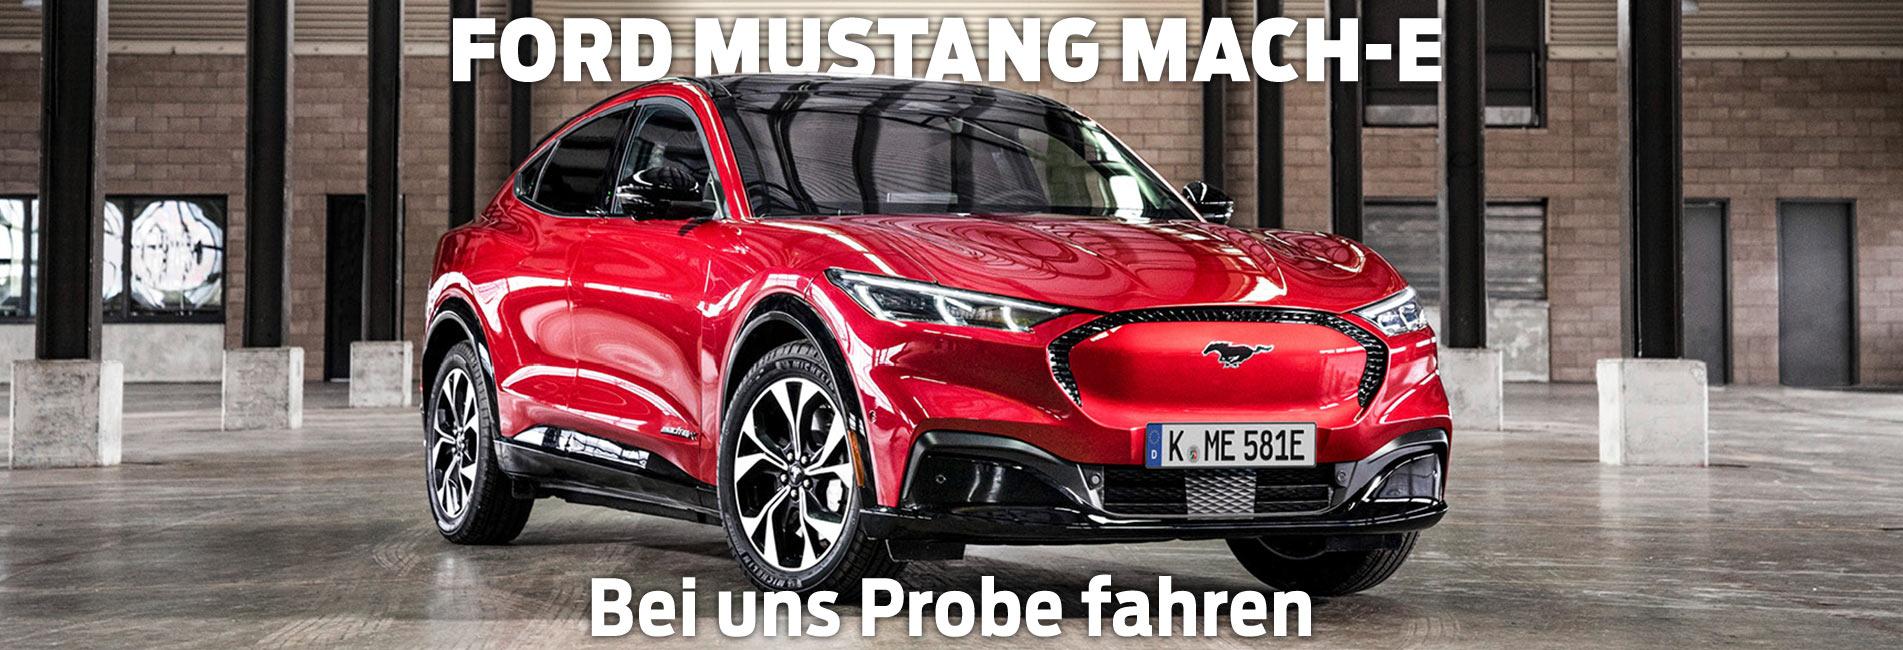 Auto_Schollenberger_Mach-E_2